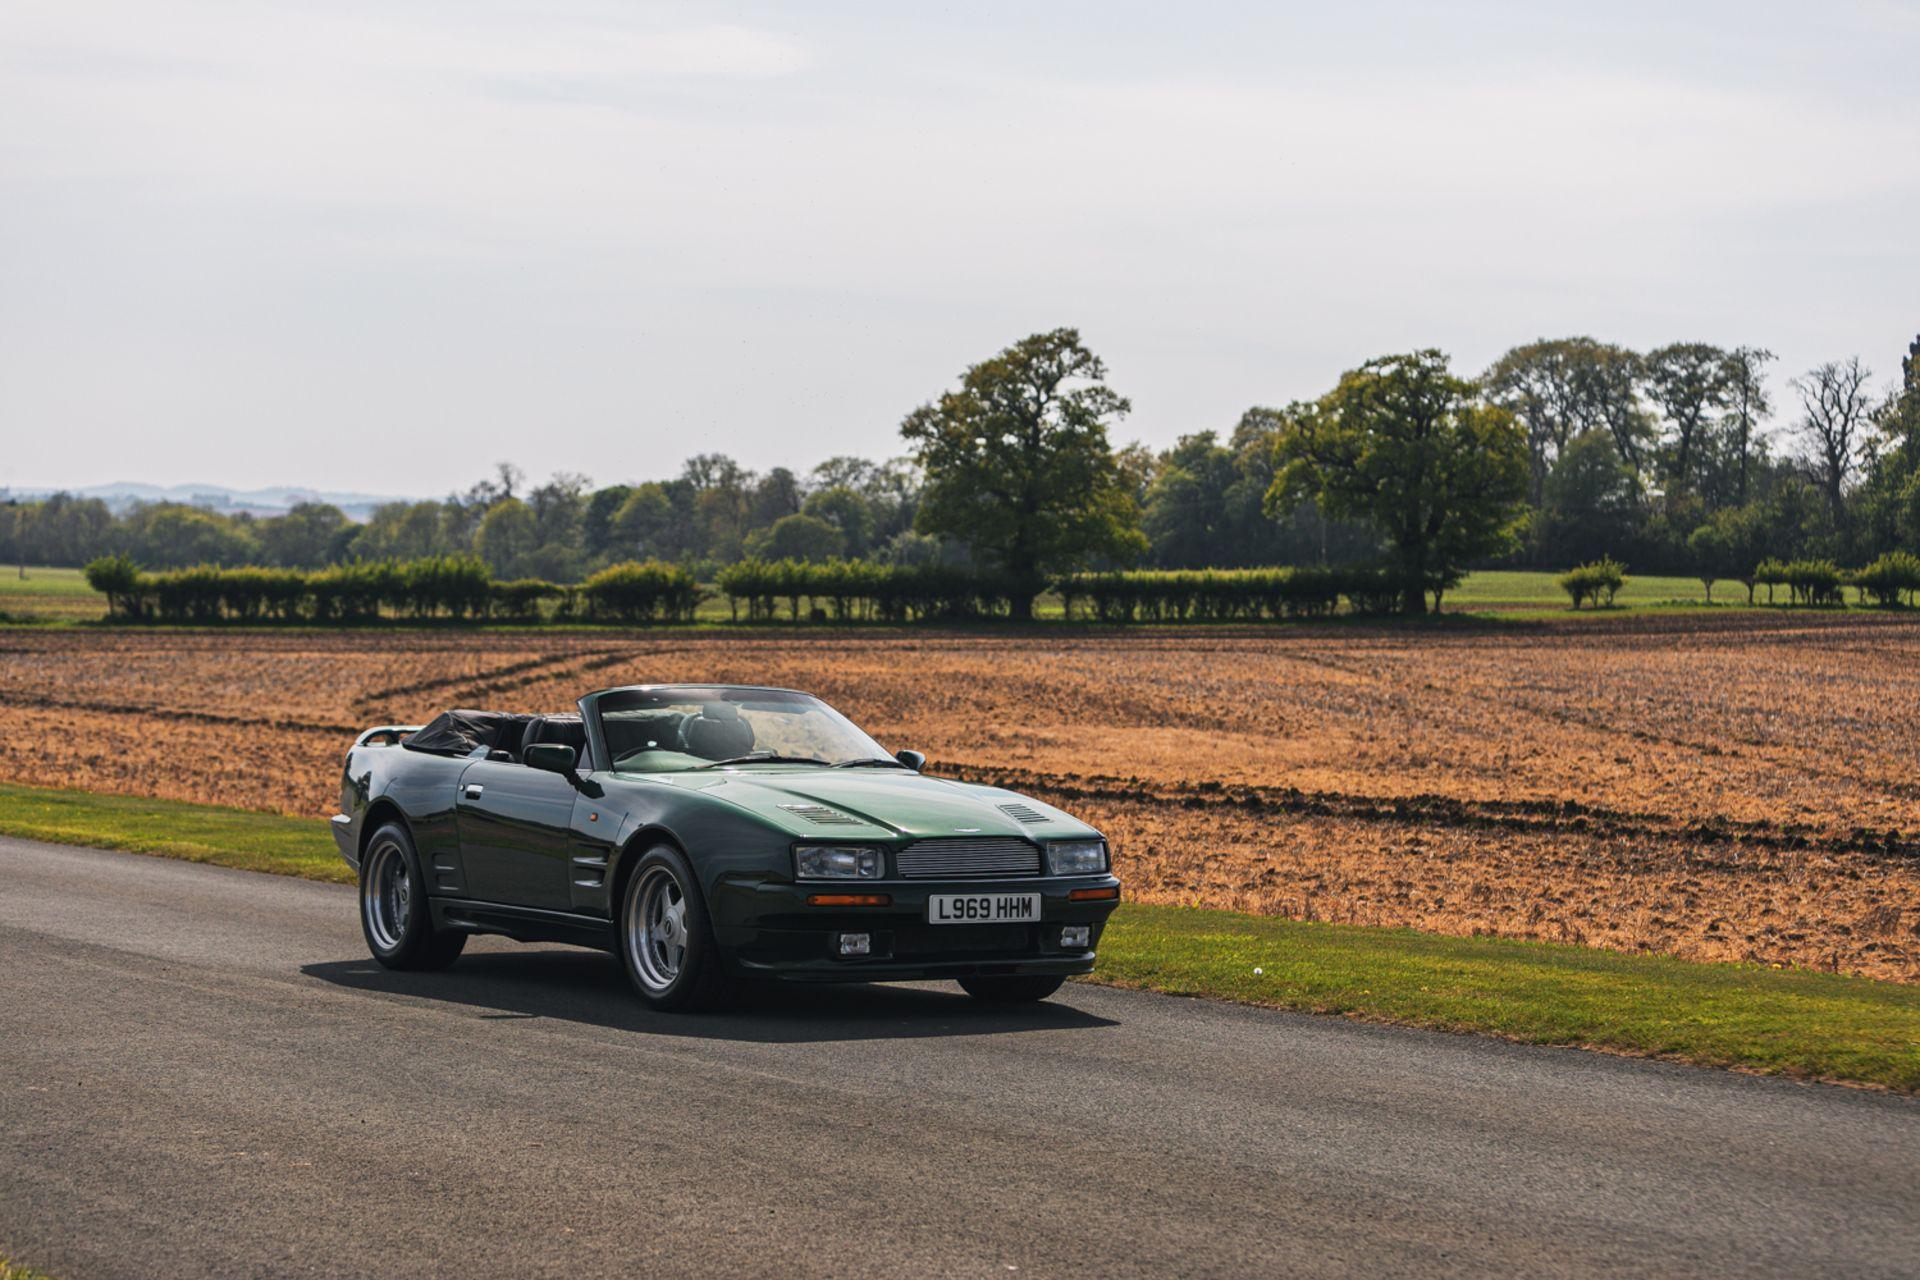 Lot 119 - 1994 Aston Martin Virage 'Widebody' Volante (6.3-Litre)